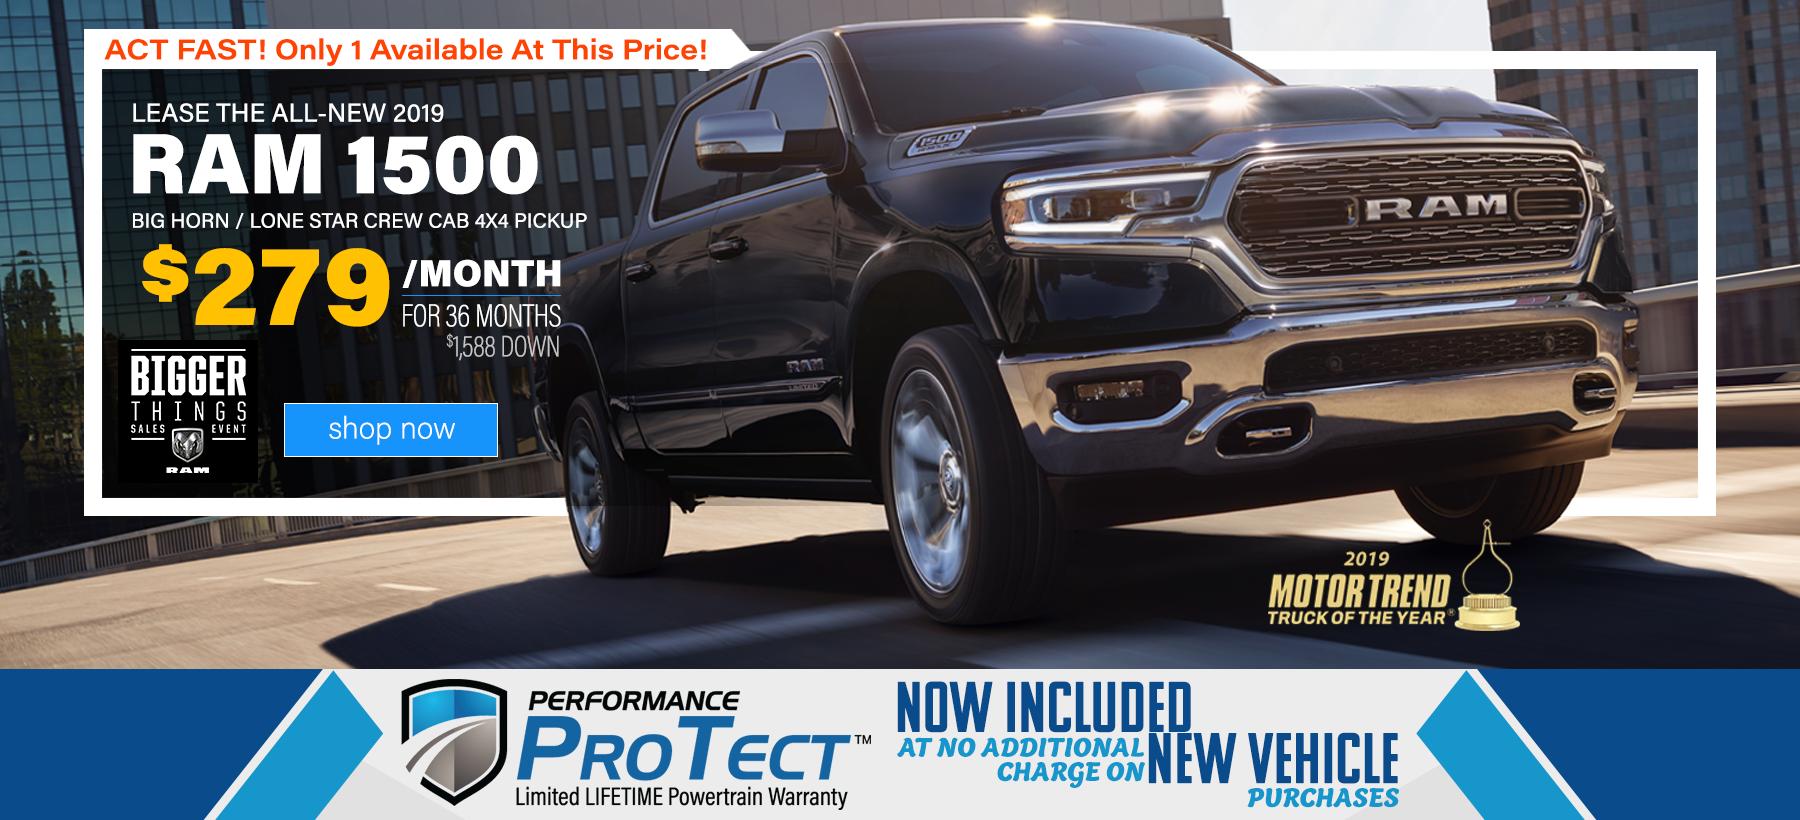 all-new-2019-ram-1500-lease-dayton-ohio